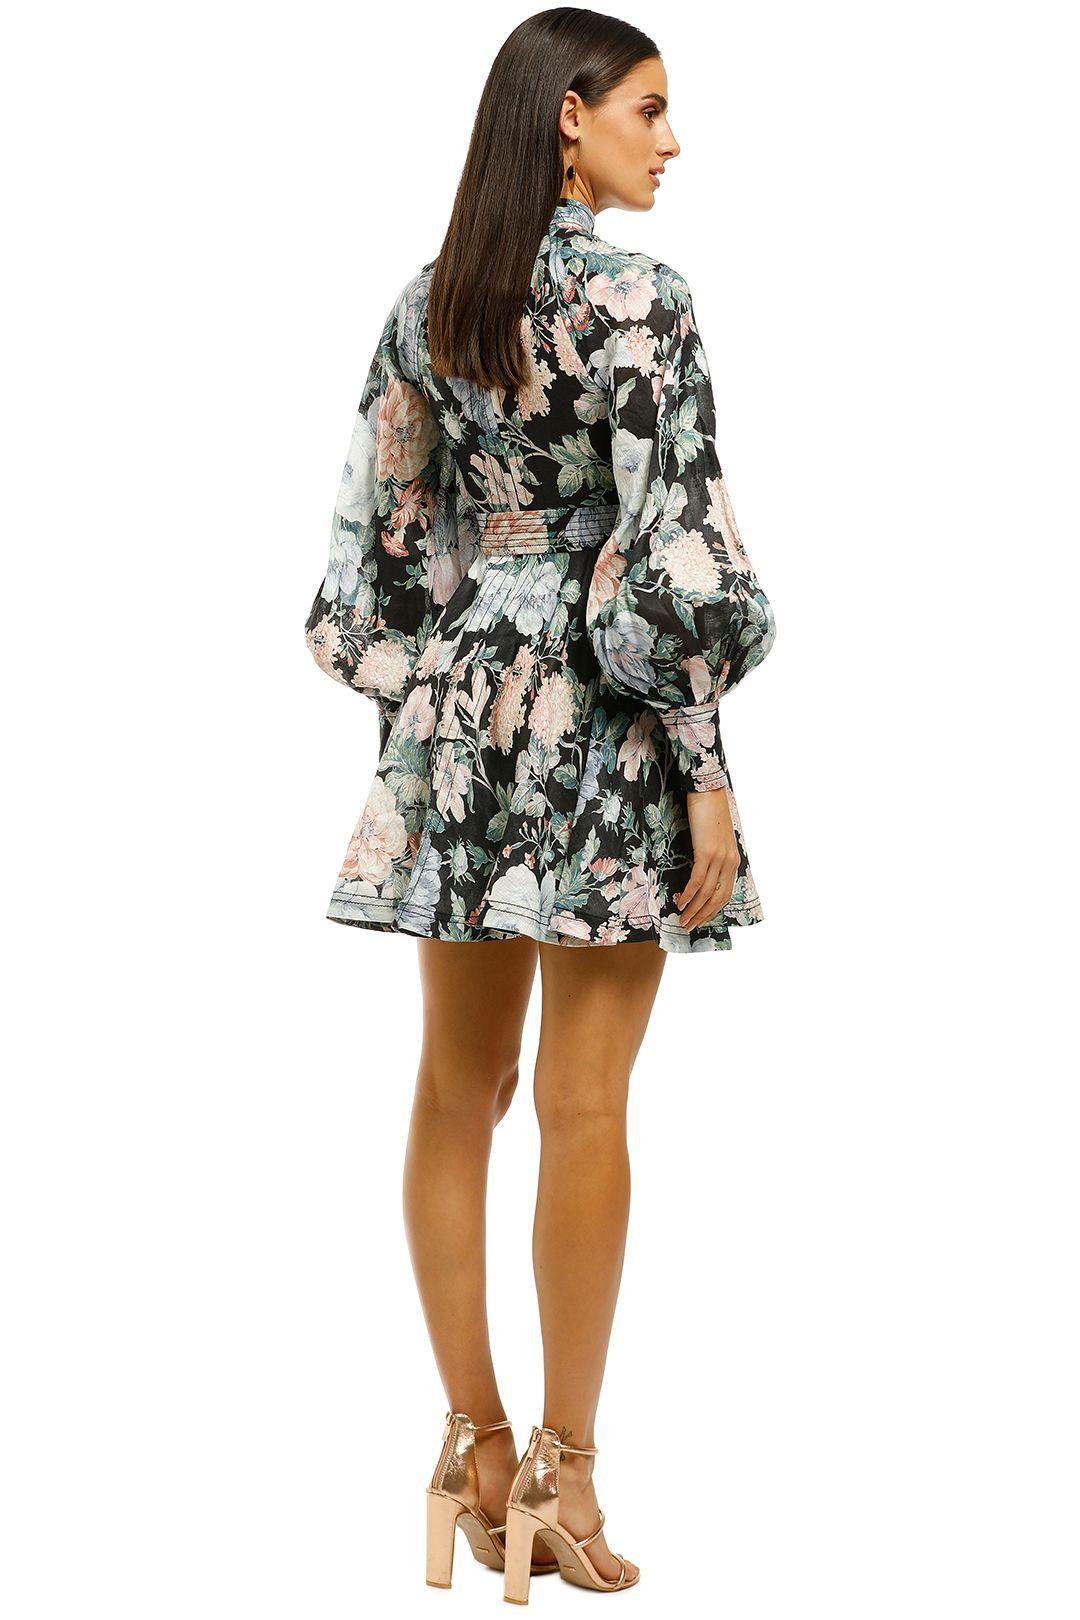 Zimmermann-Verity-Rouleau-Short-Dress-Black-Floral-Back